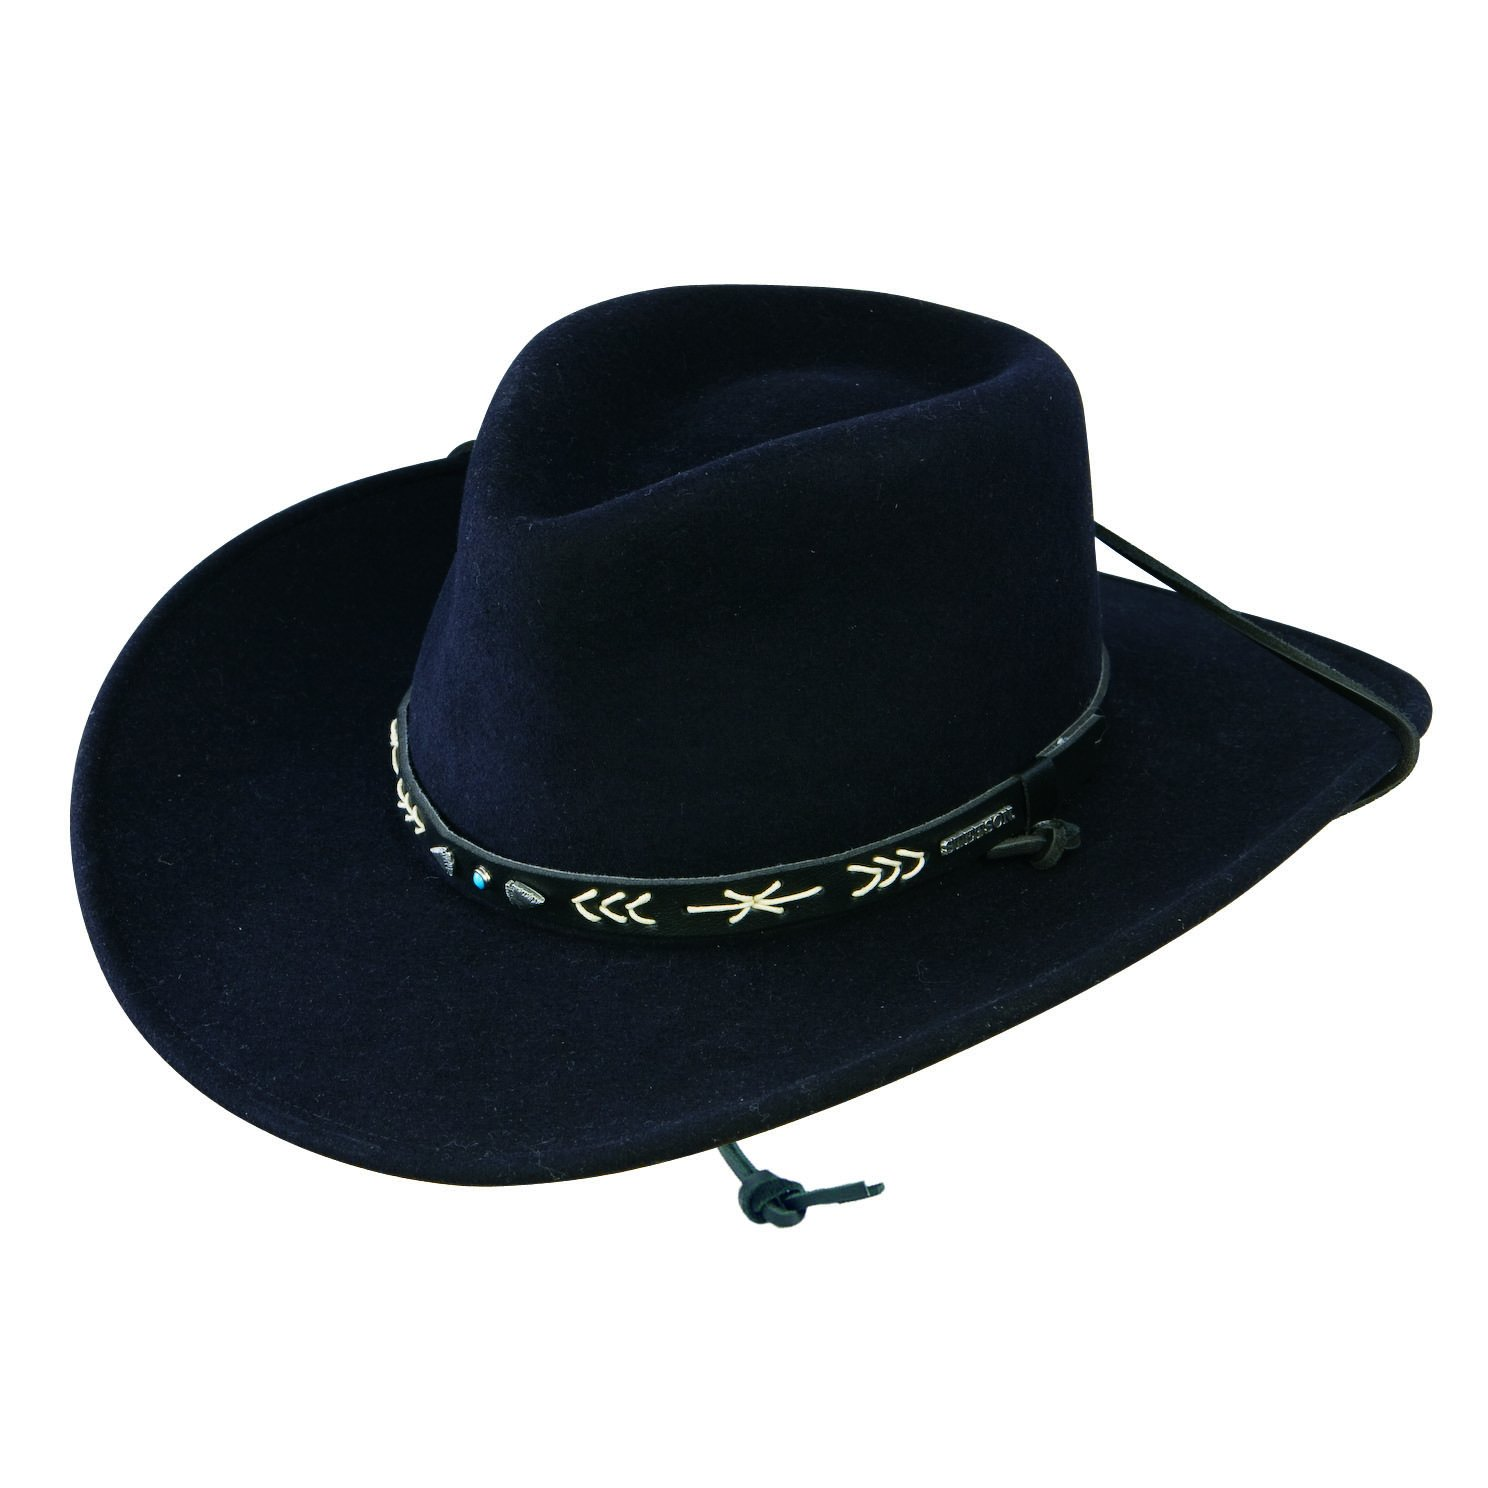 Stetson Men's Santa Fe Crushable Wool Hat - 7 7/8 - Black